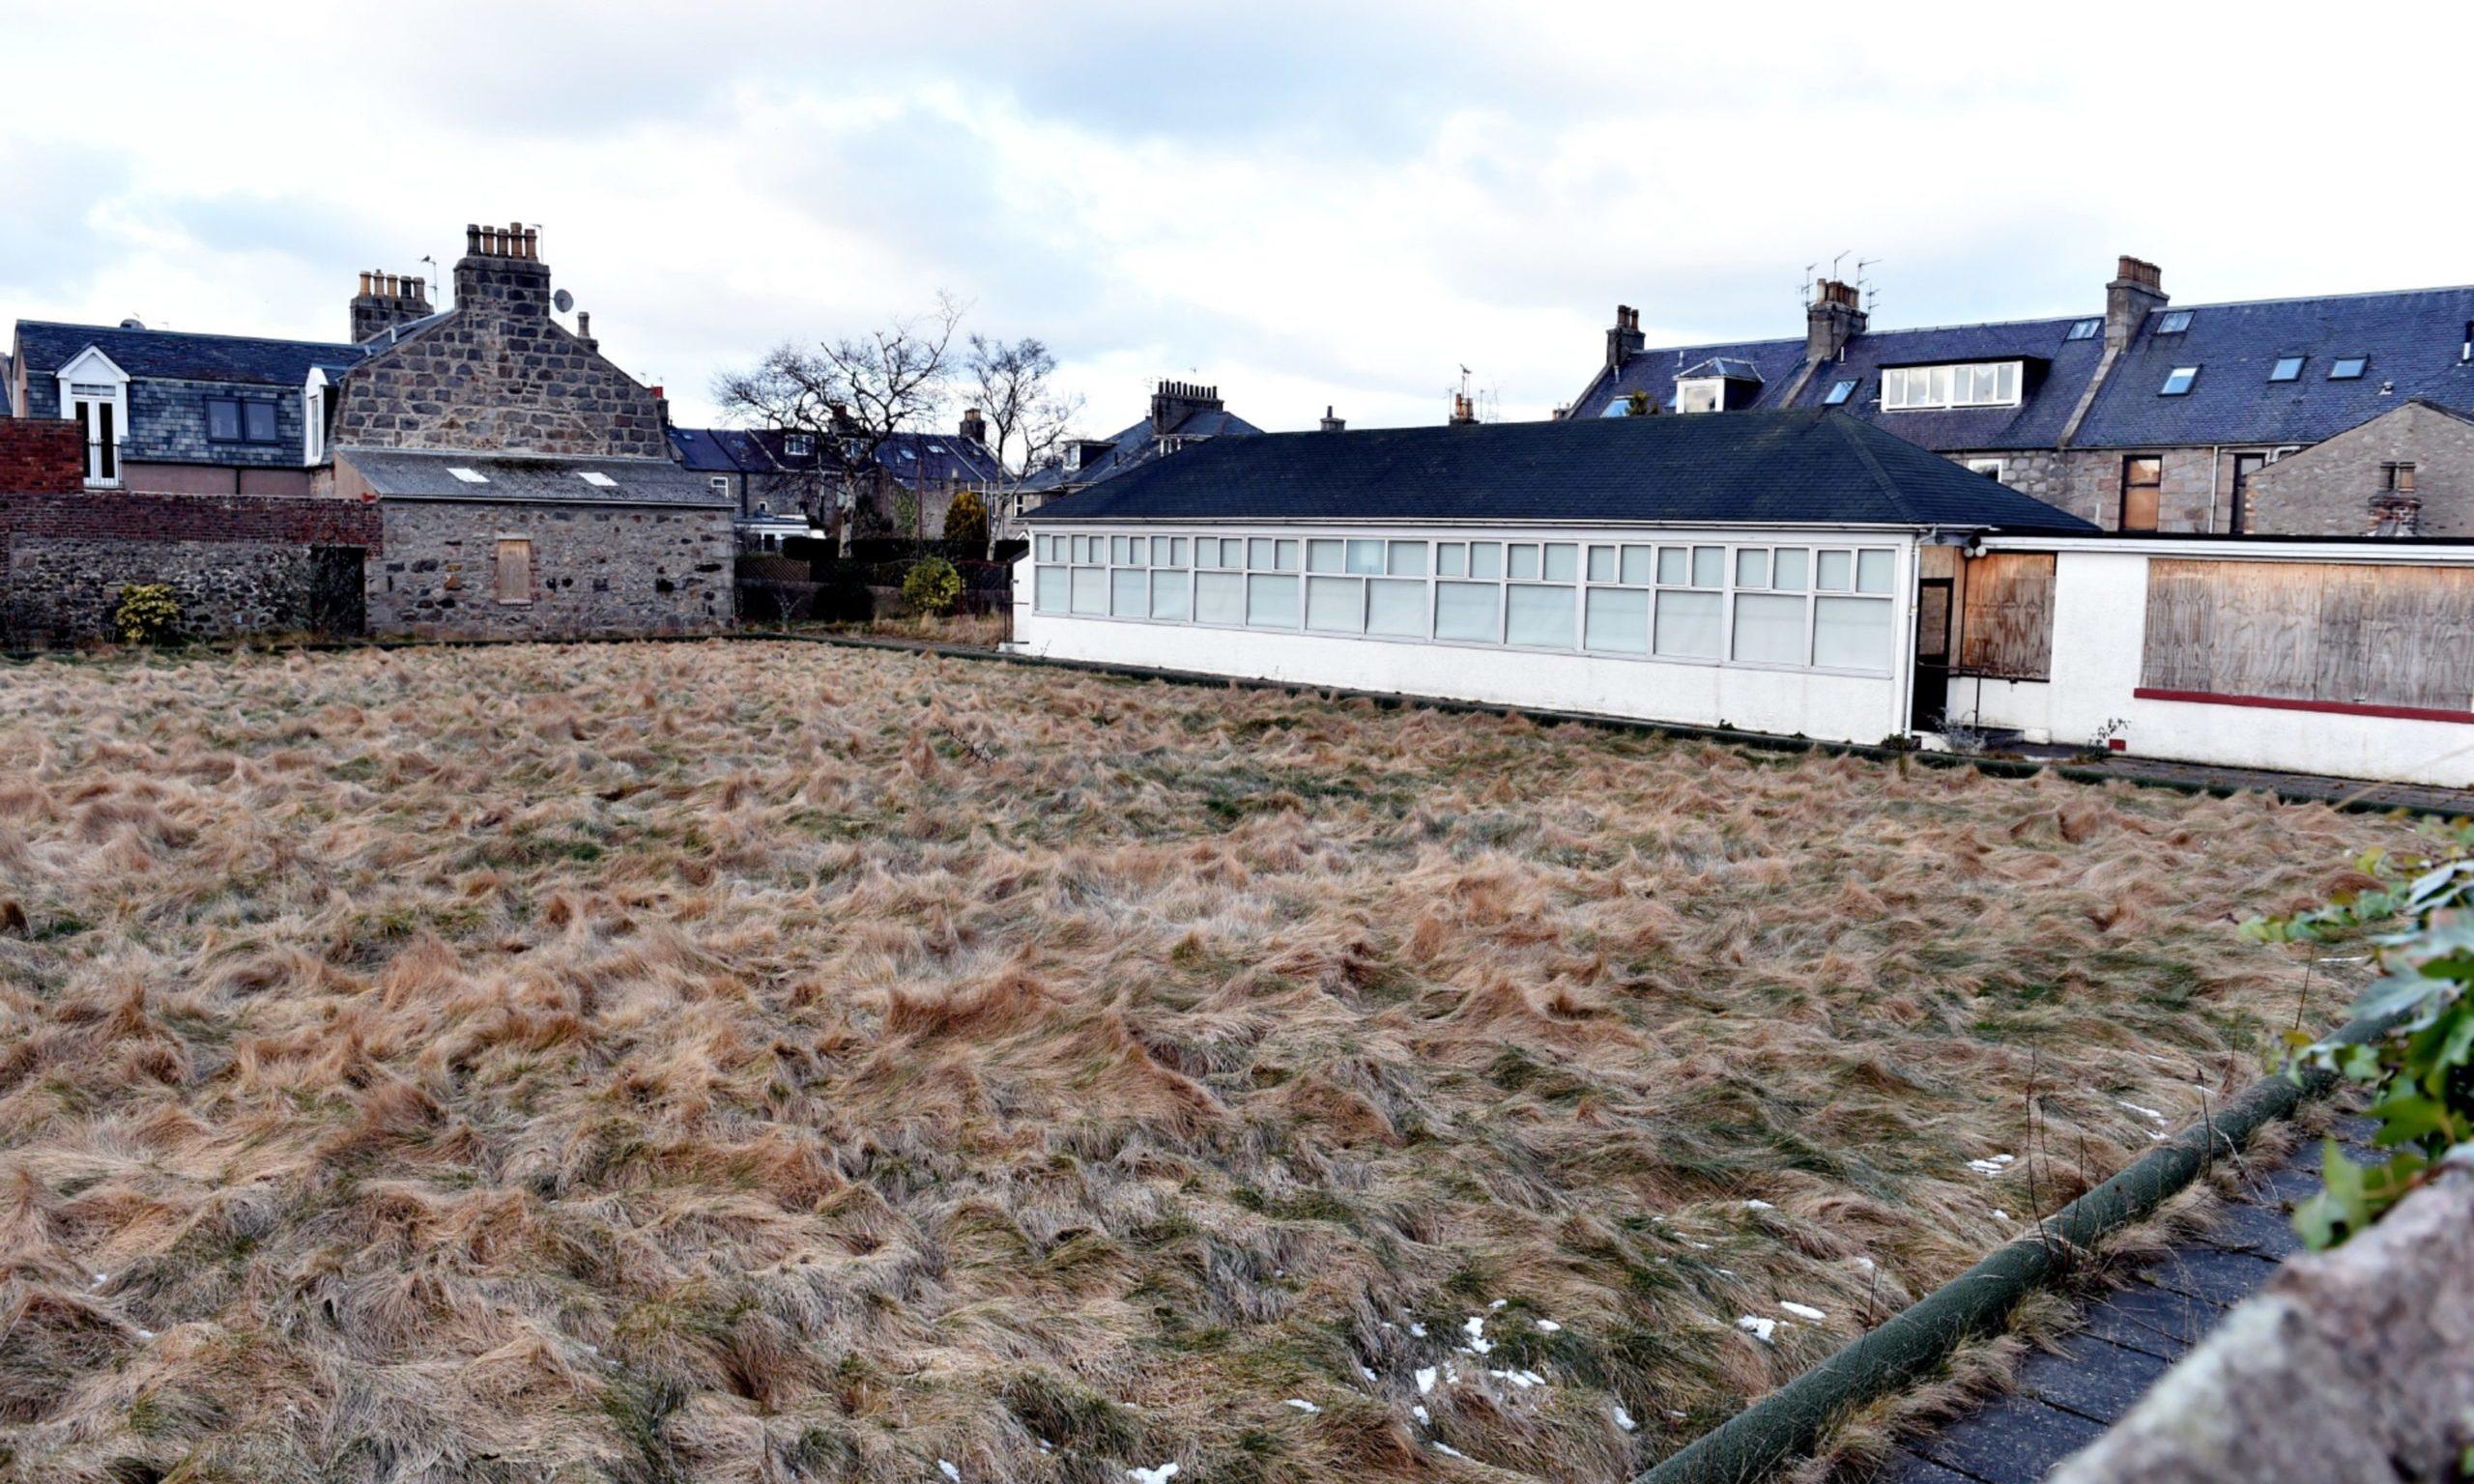 Bonnymuir Bowling Green in Aberdeen, before the community asset transfer.